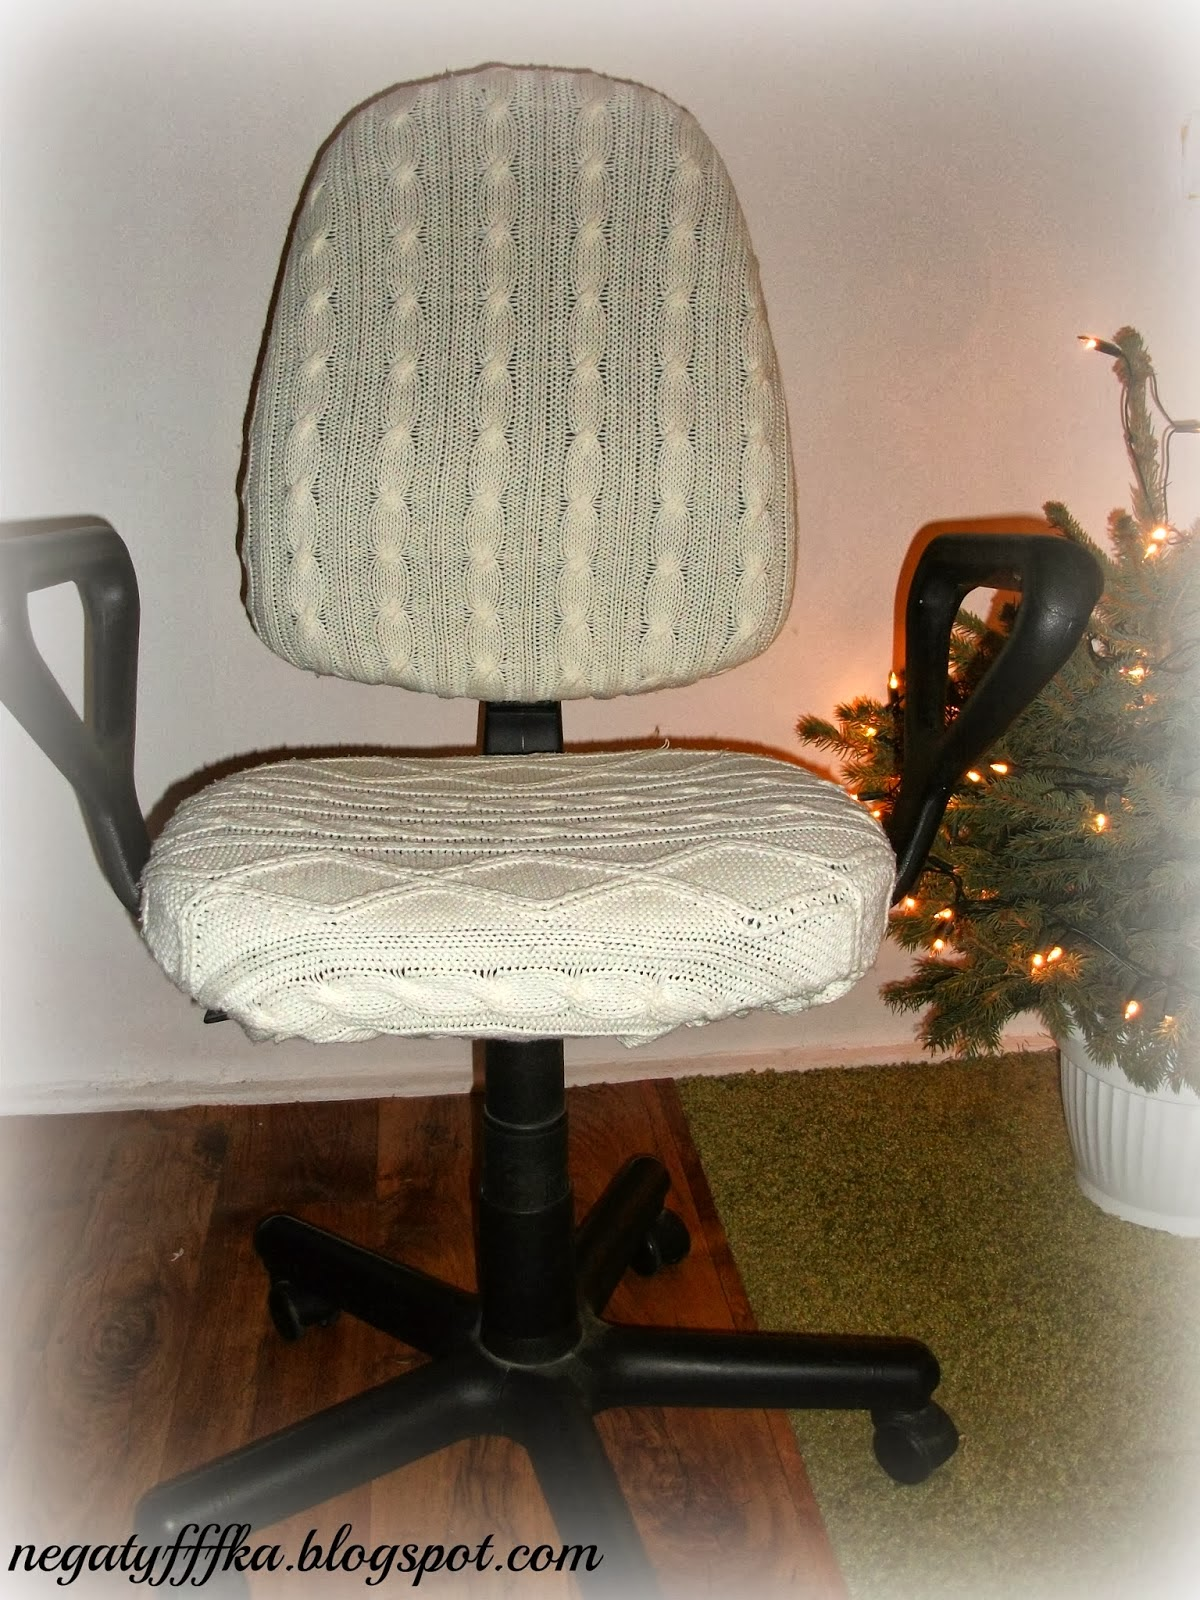 http://negatyfffka.blogspot.com/2014/01/knit-furniture.html